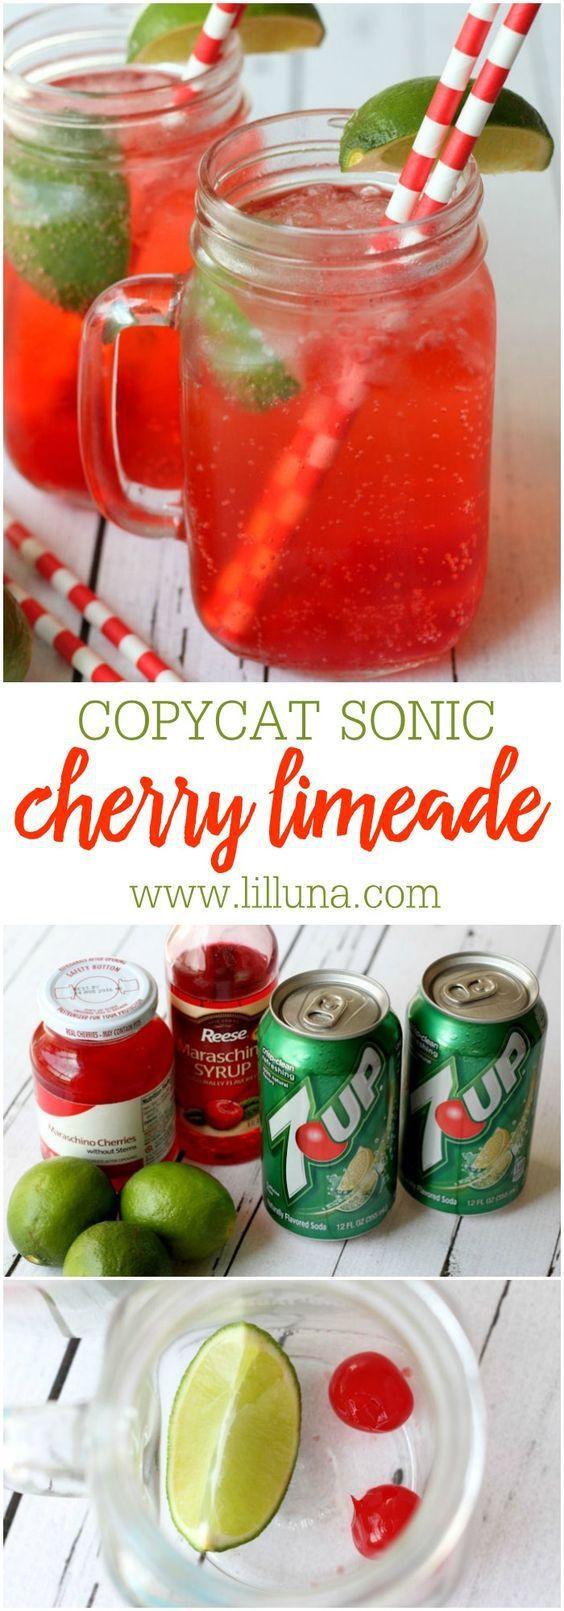 Summer Vodka Drinks For A Crowd  25 best ideas about Cherry vodka drinks on Pinterest